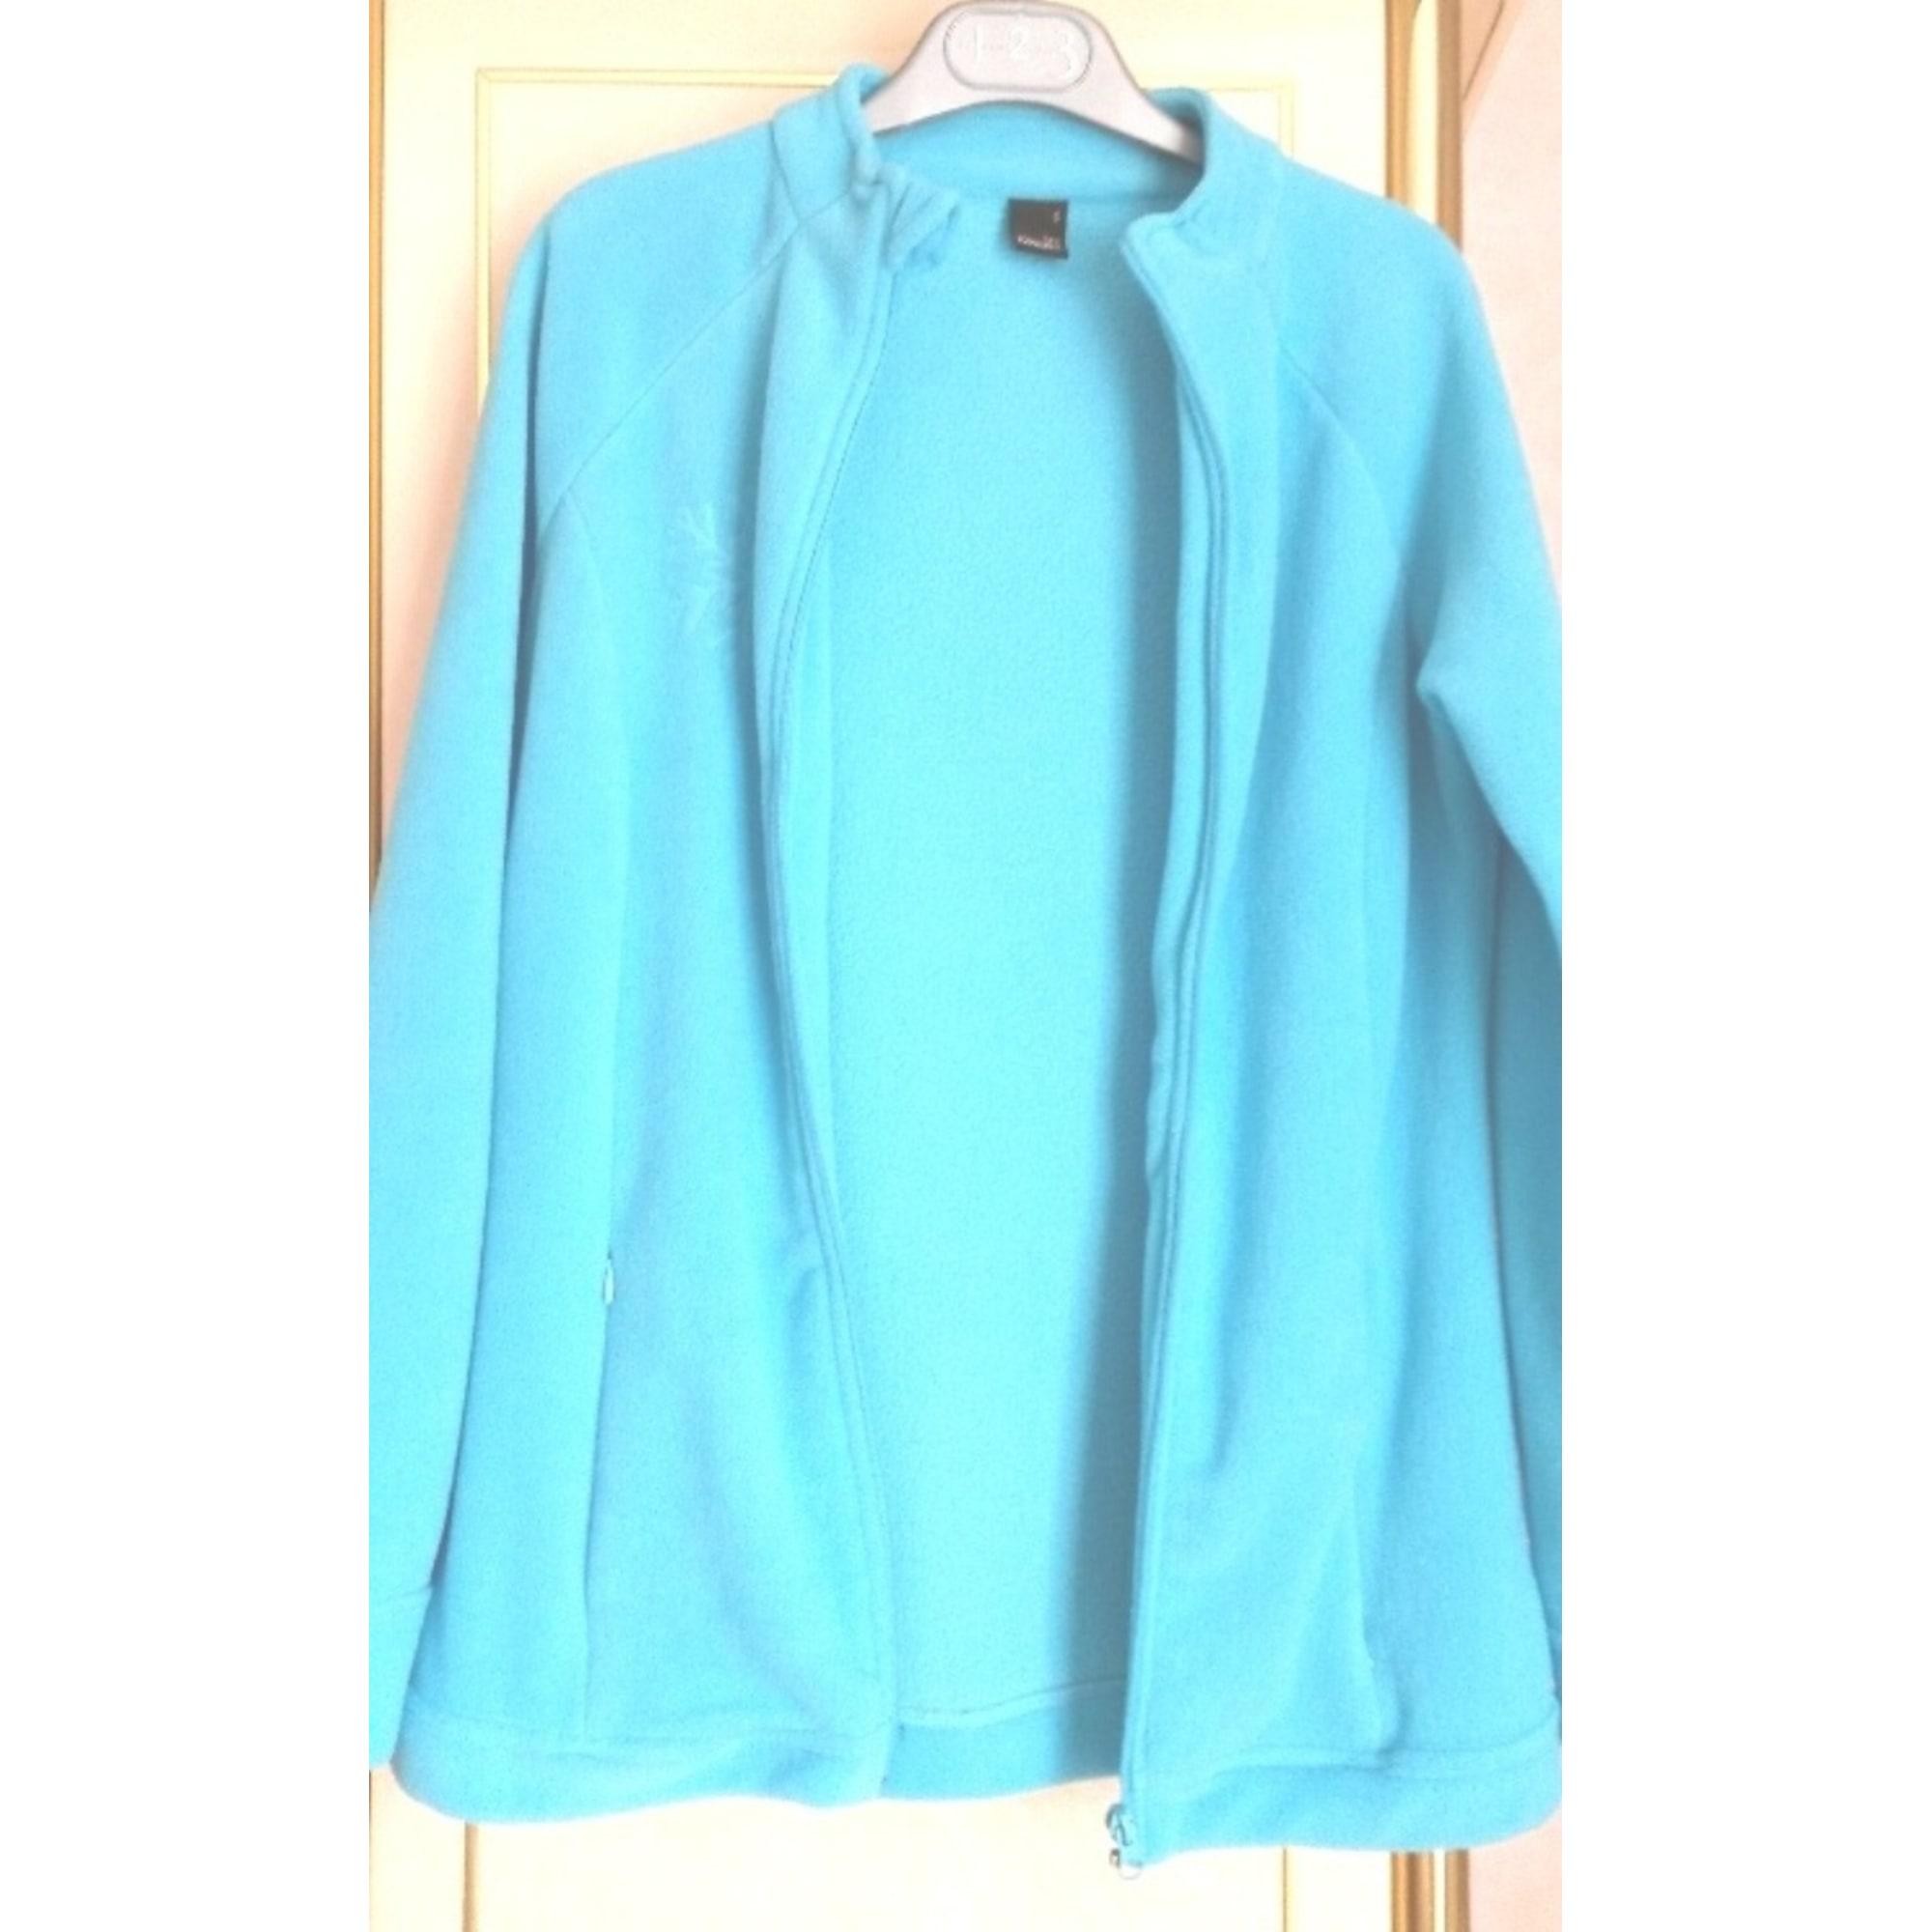 Sweat TEX SPORT CONCEPT Bleu, bleu marine, bleu turquoise